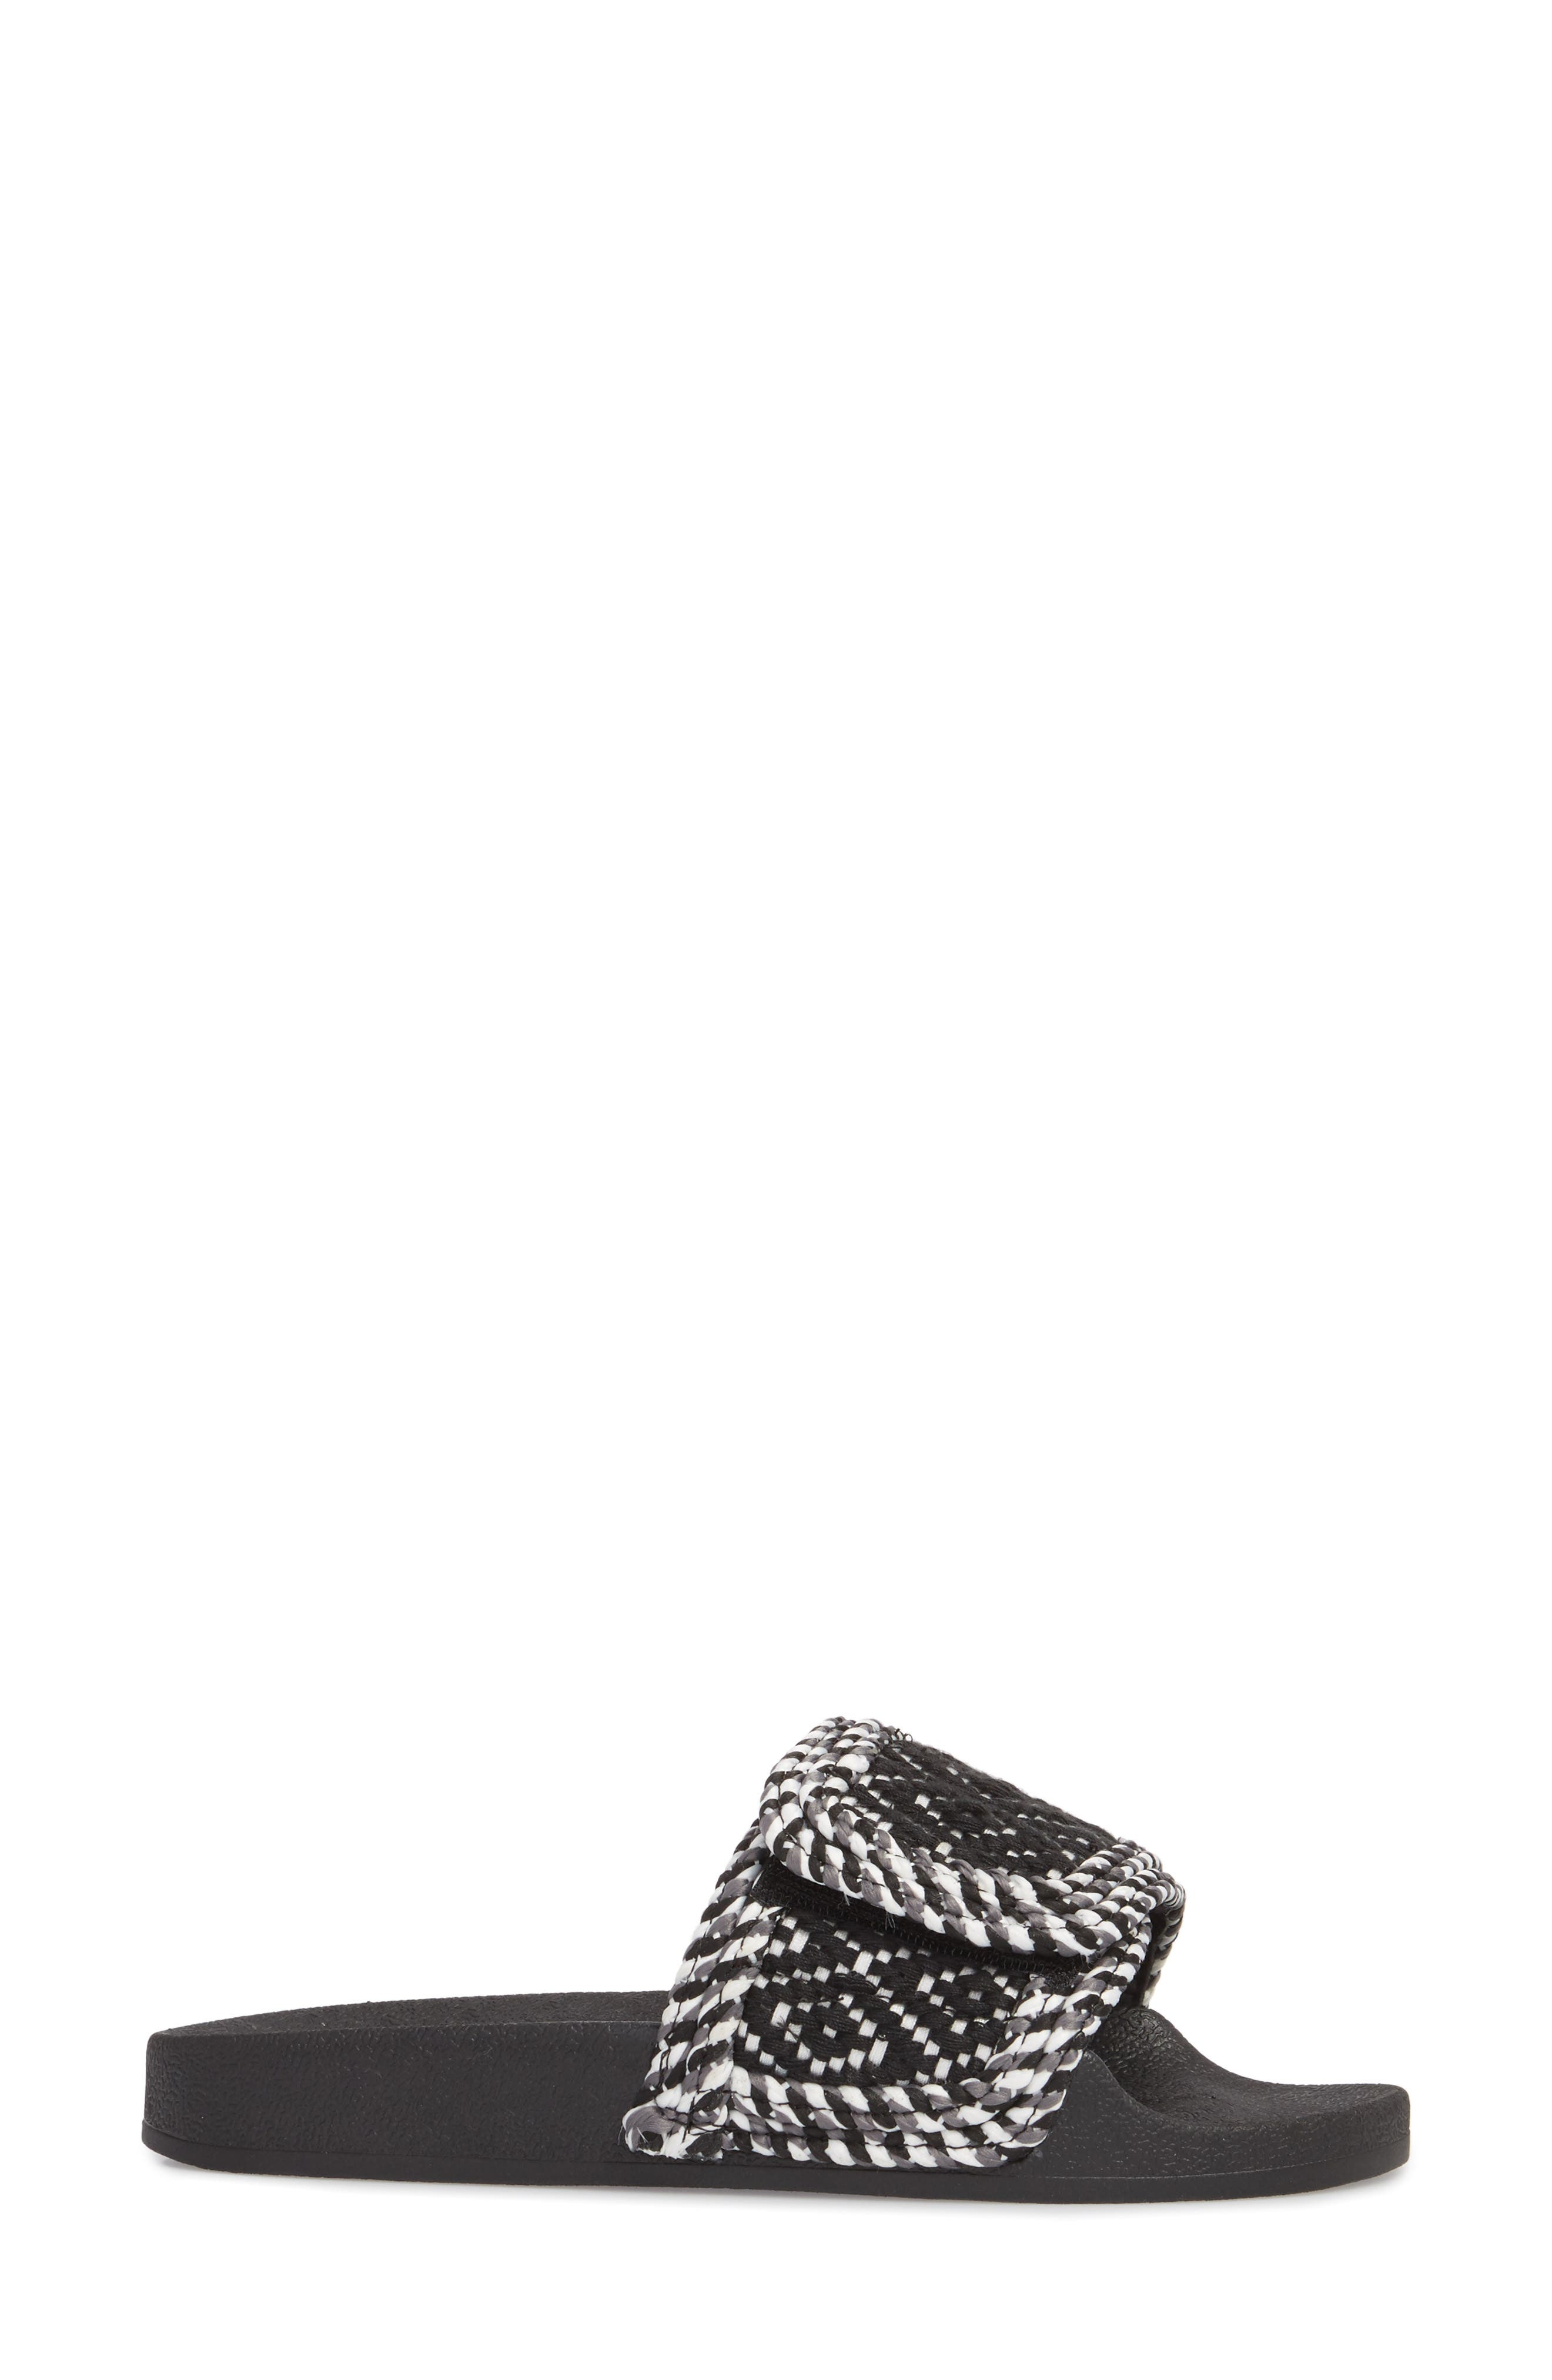 Tressa Woven Slide Sandal,                             Alternate thumbnail 3, color,                             Black/ White Woven Fabric